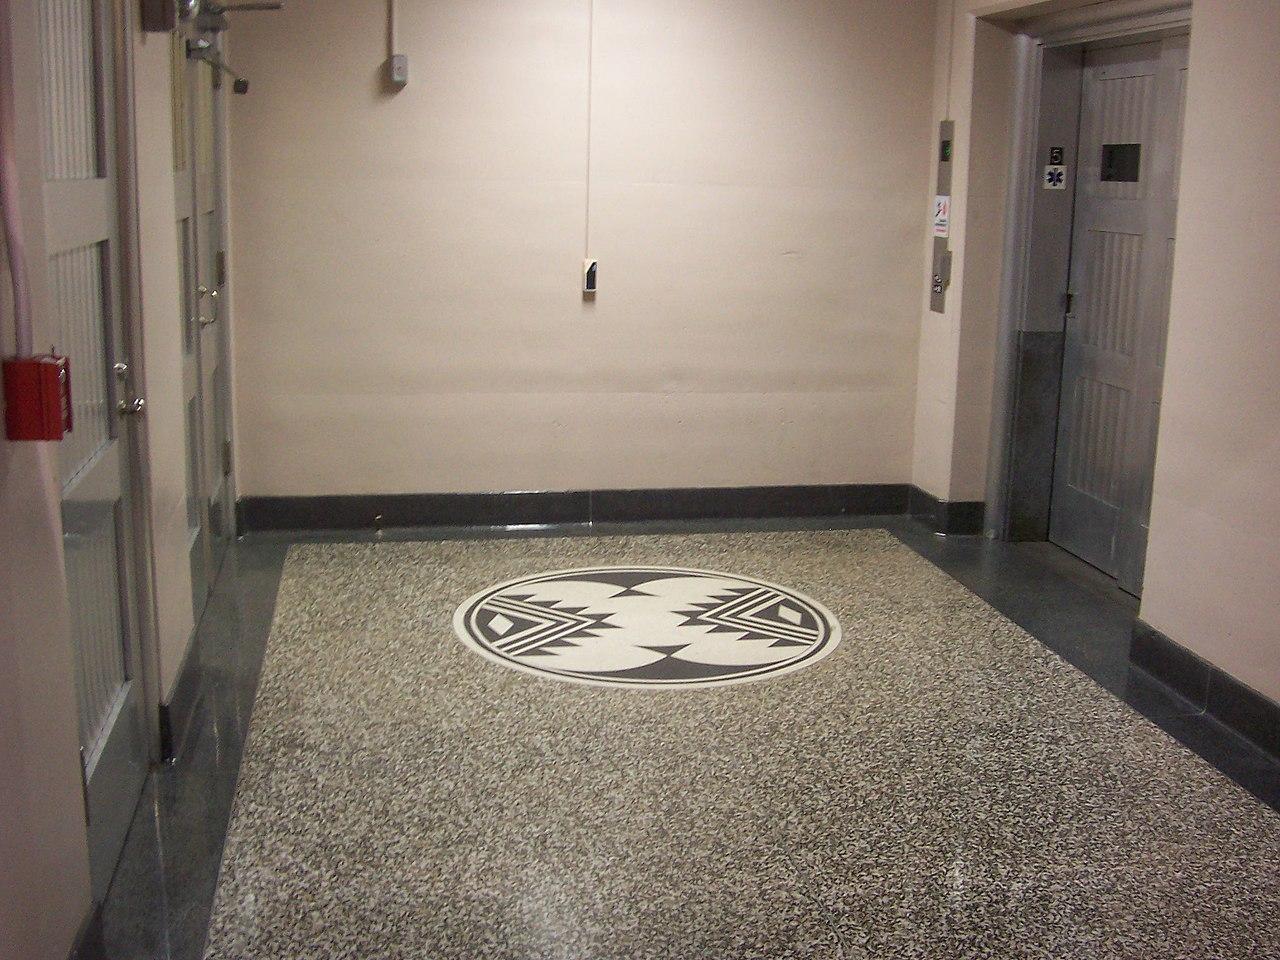 best granite colors for living room india and kitchen divider design file hoover dam tile floor jpg wikimedia commons